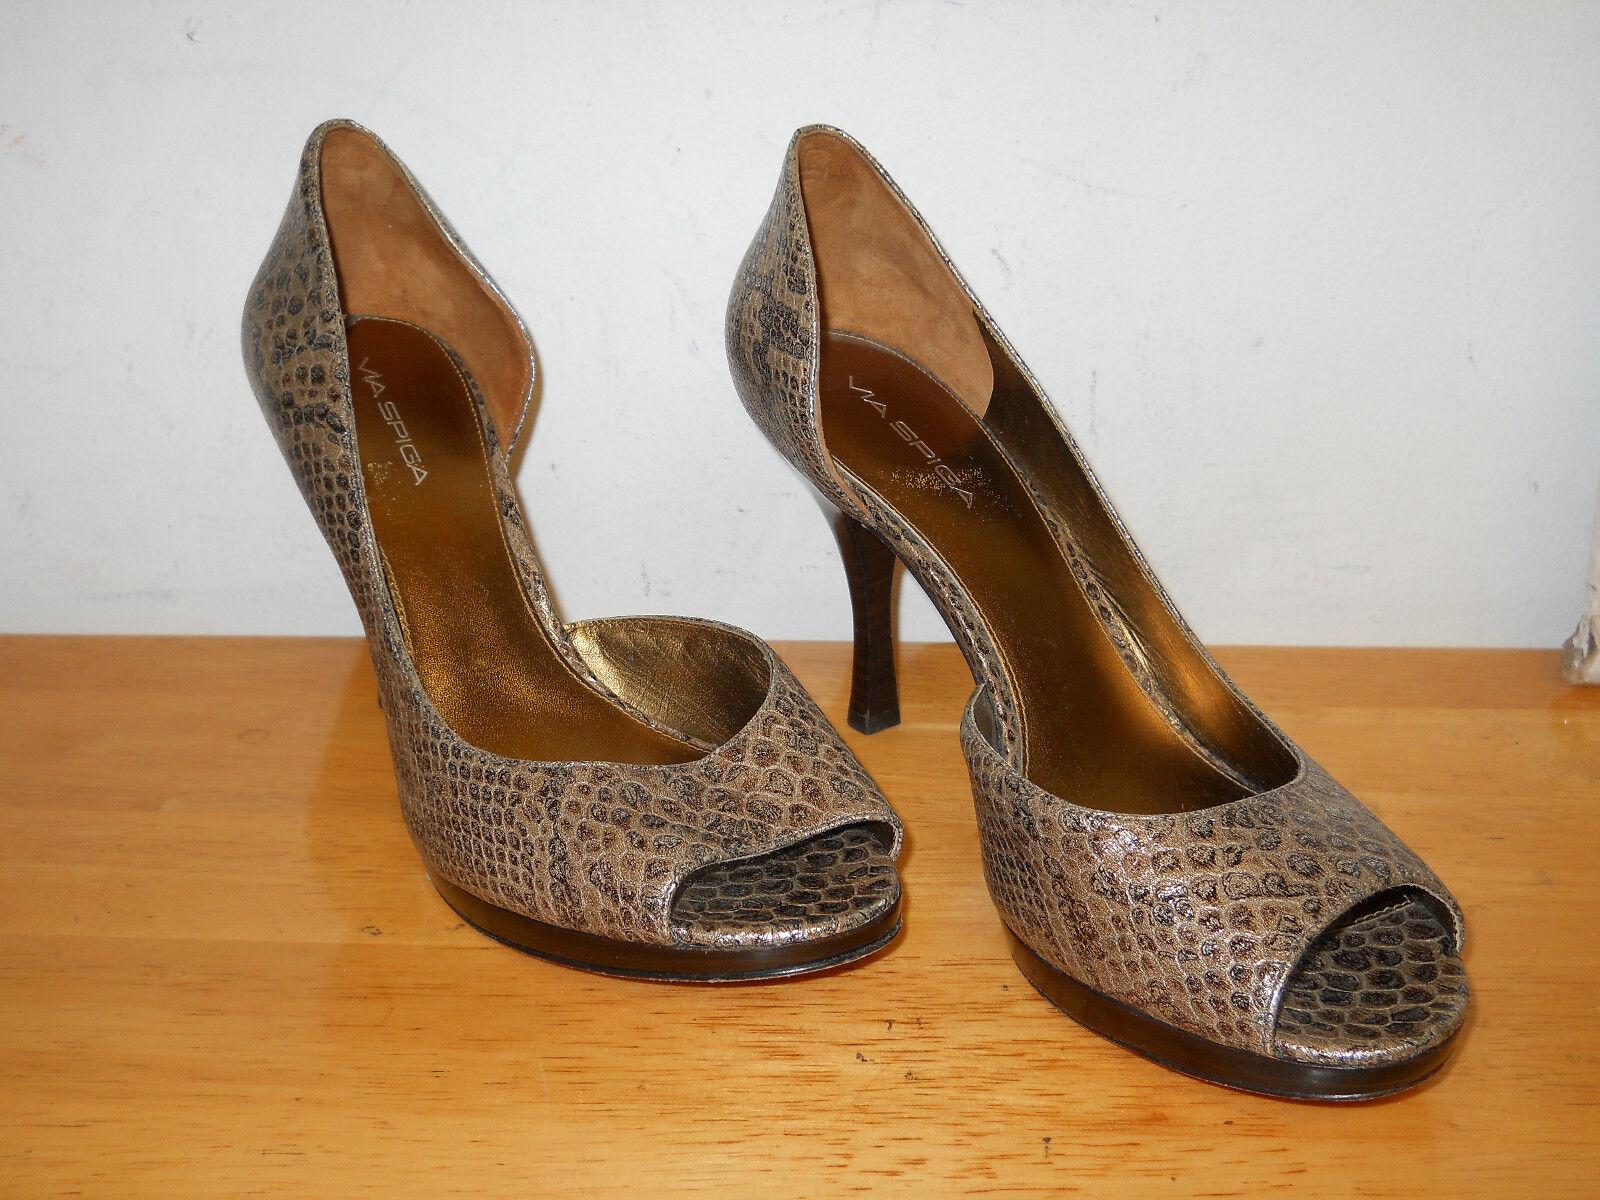 Via Spiga NEU Damenschuhe Malibu Braun Multi Open Toe Heels 10 M Schuhes NWOB